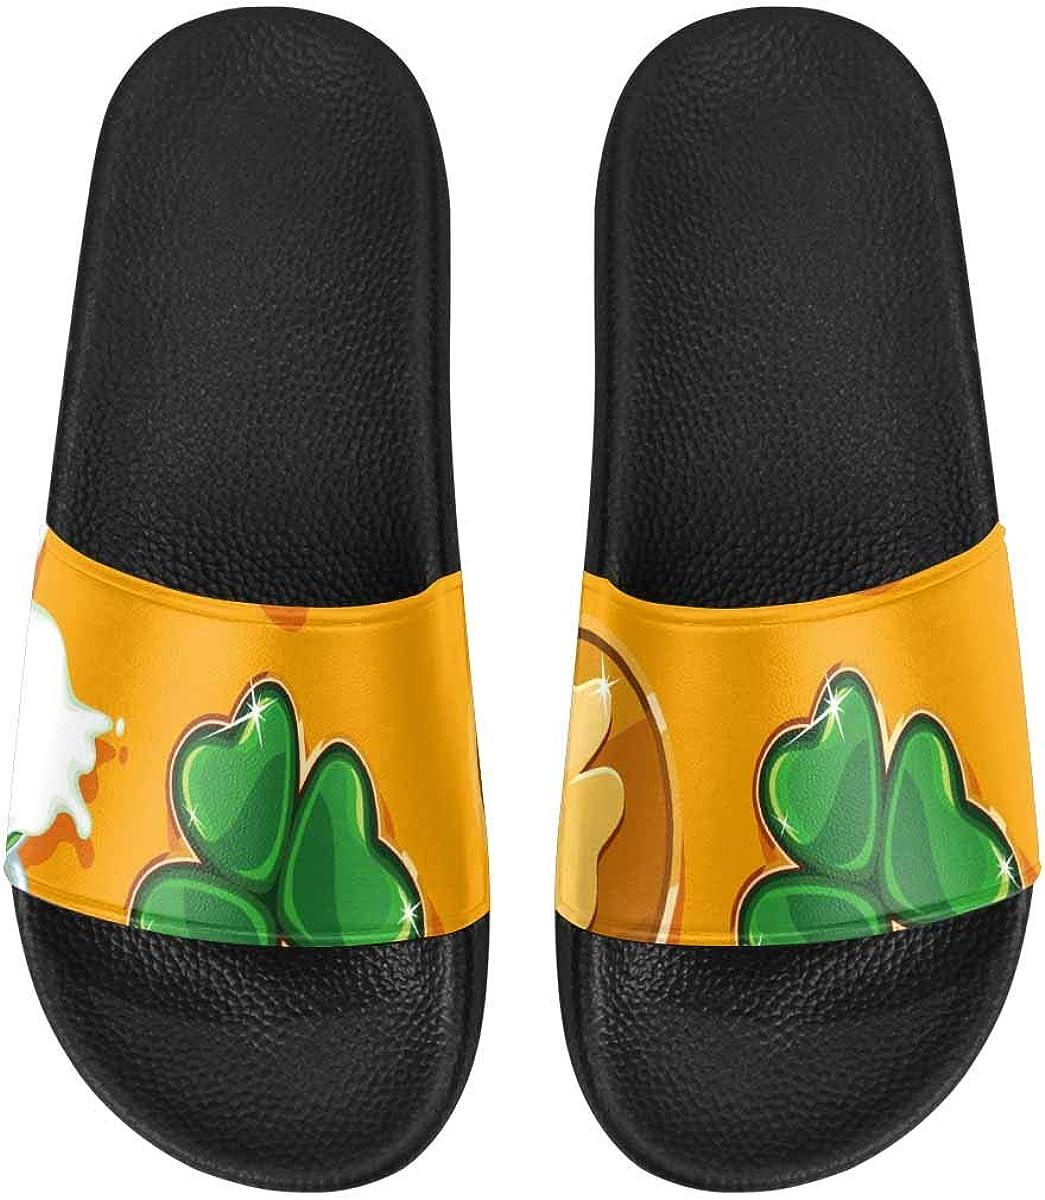 InterestPrint Women's Casual and Lightweight Slipper Sandals for Home Graduation Hat Pie Cake